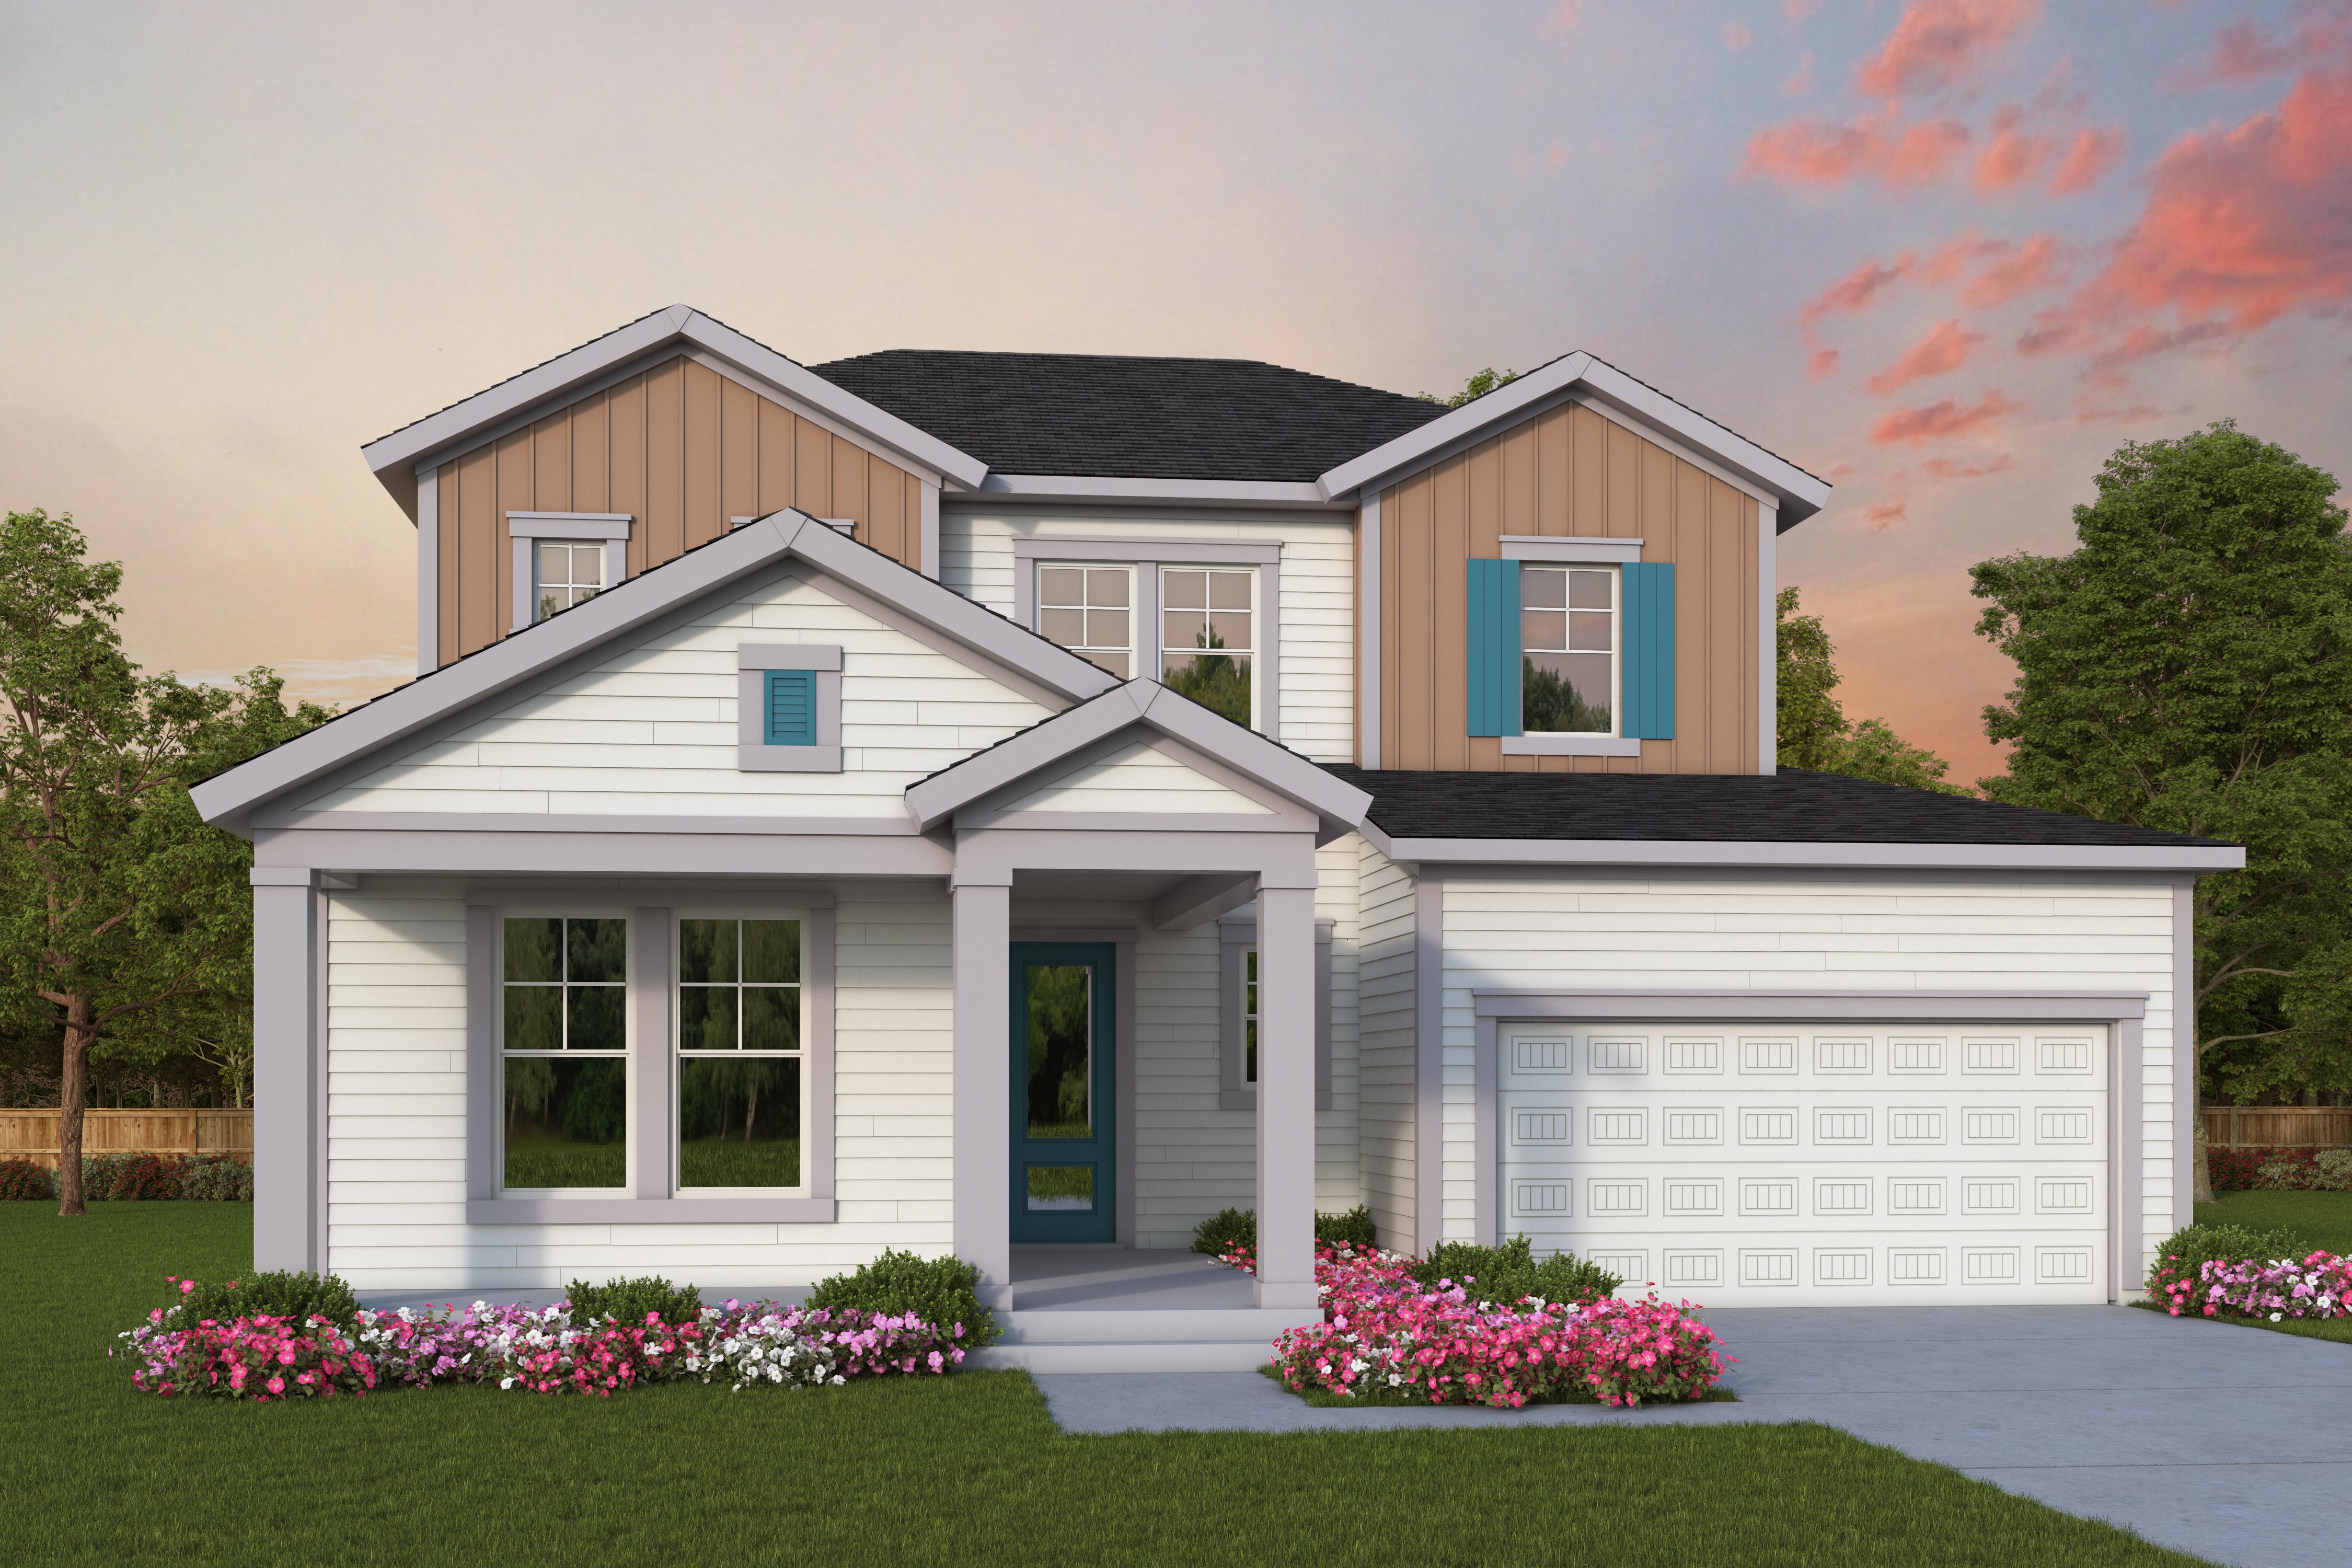 New David Weekley Homes Model